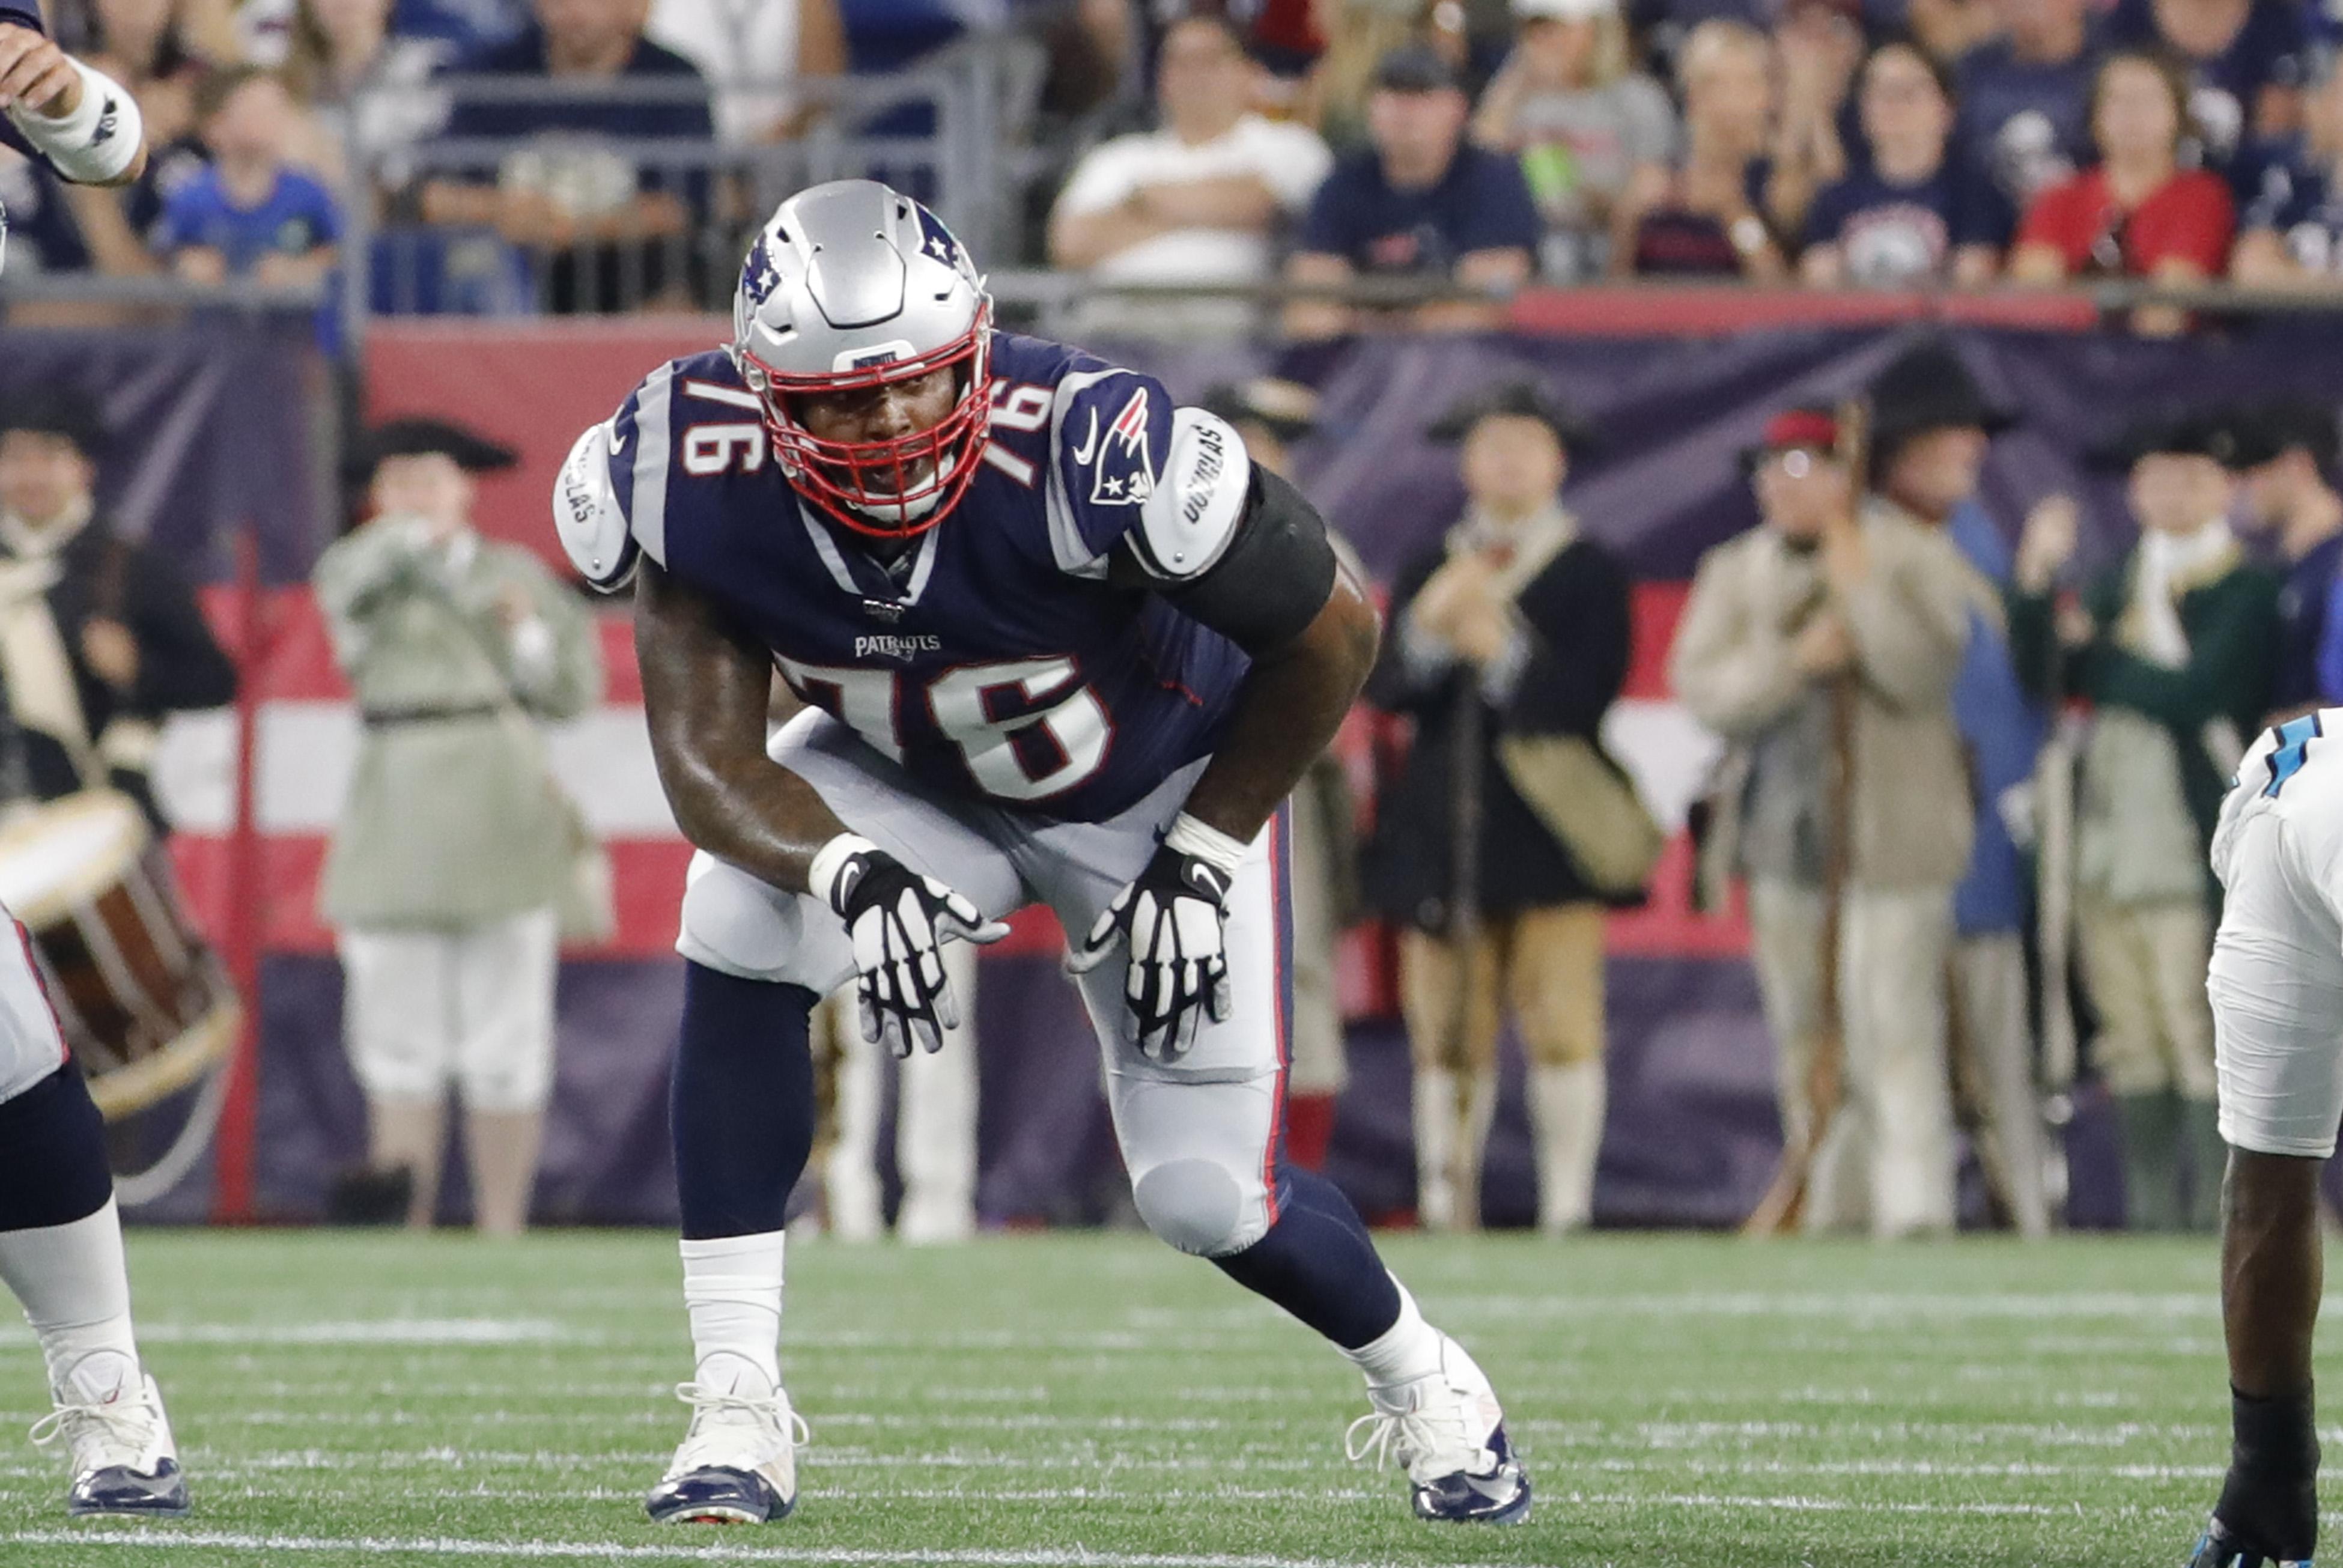 NFL: AUG 22 Preseason - Panthers at Patriots